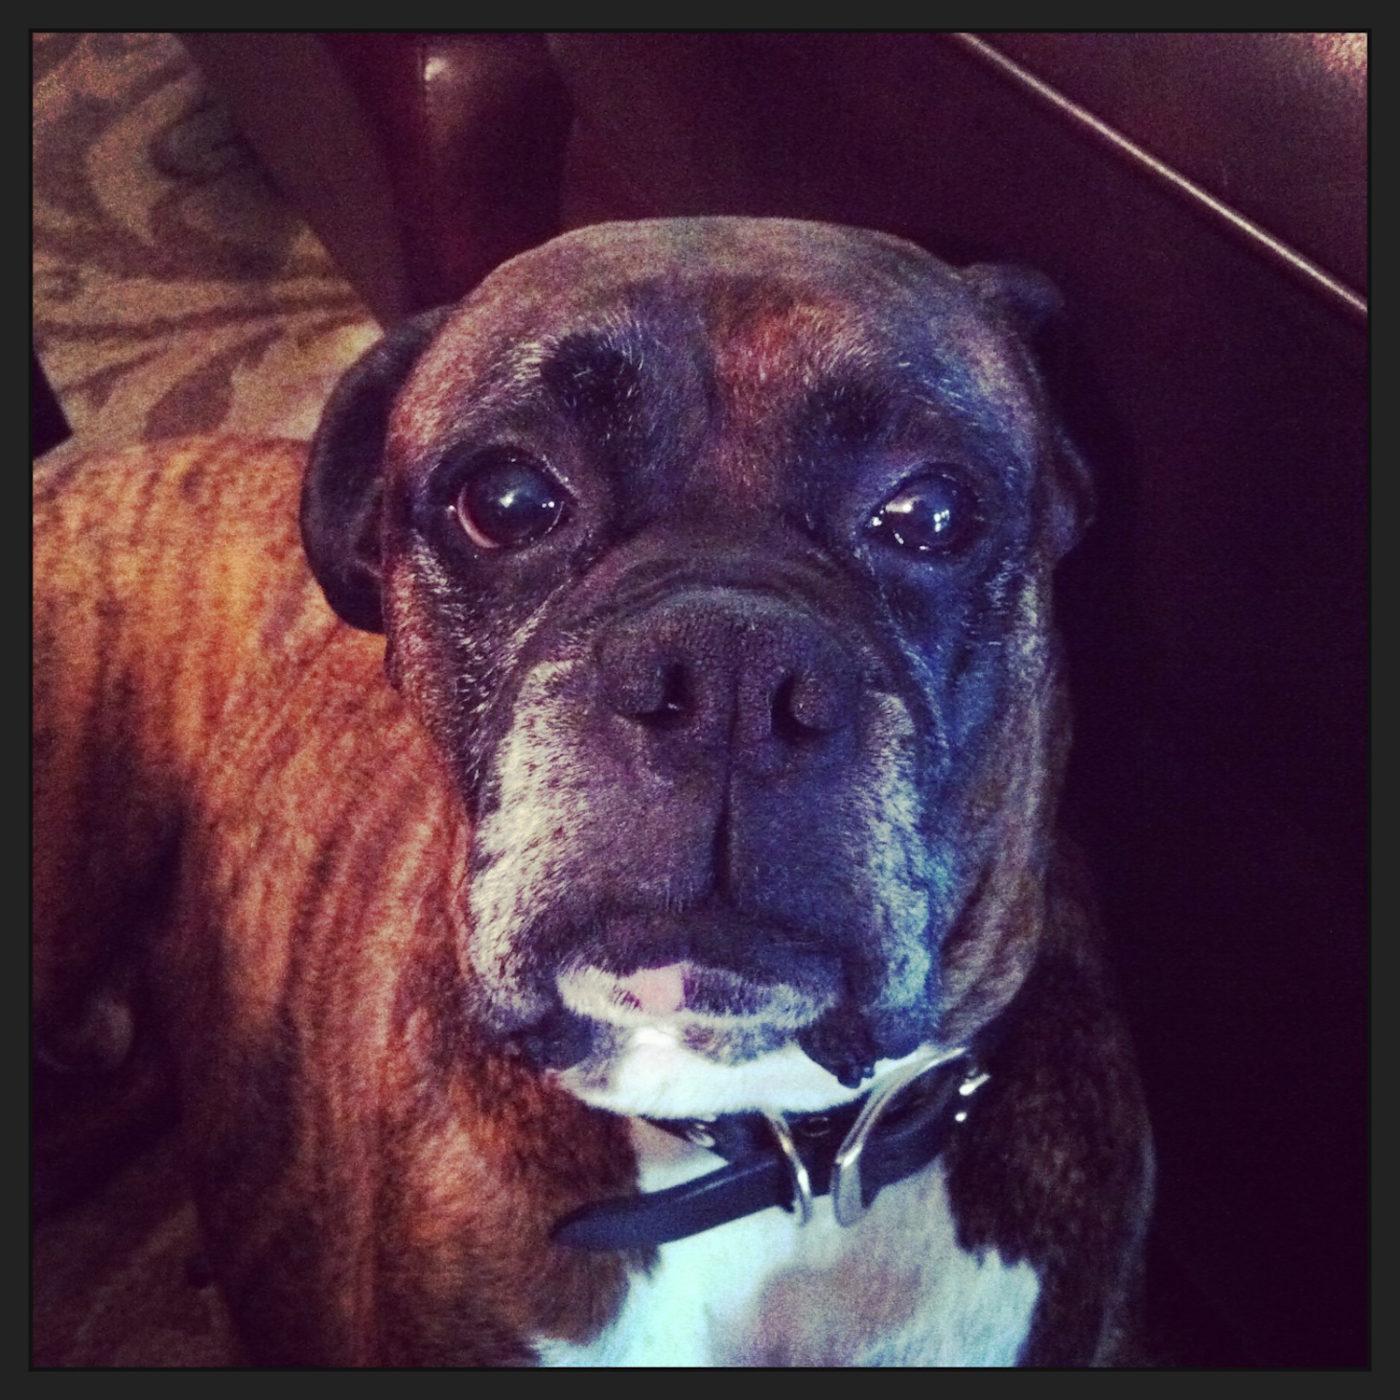 #sandiegodogs, #dogsarelove #largedogtraining, dogsofbarkbusters